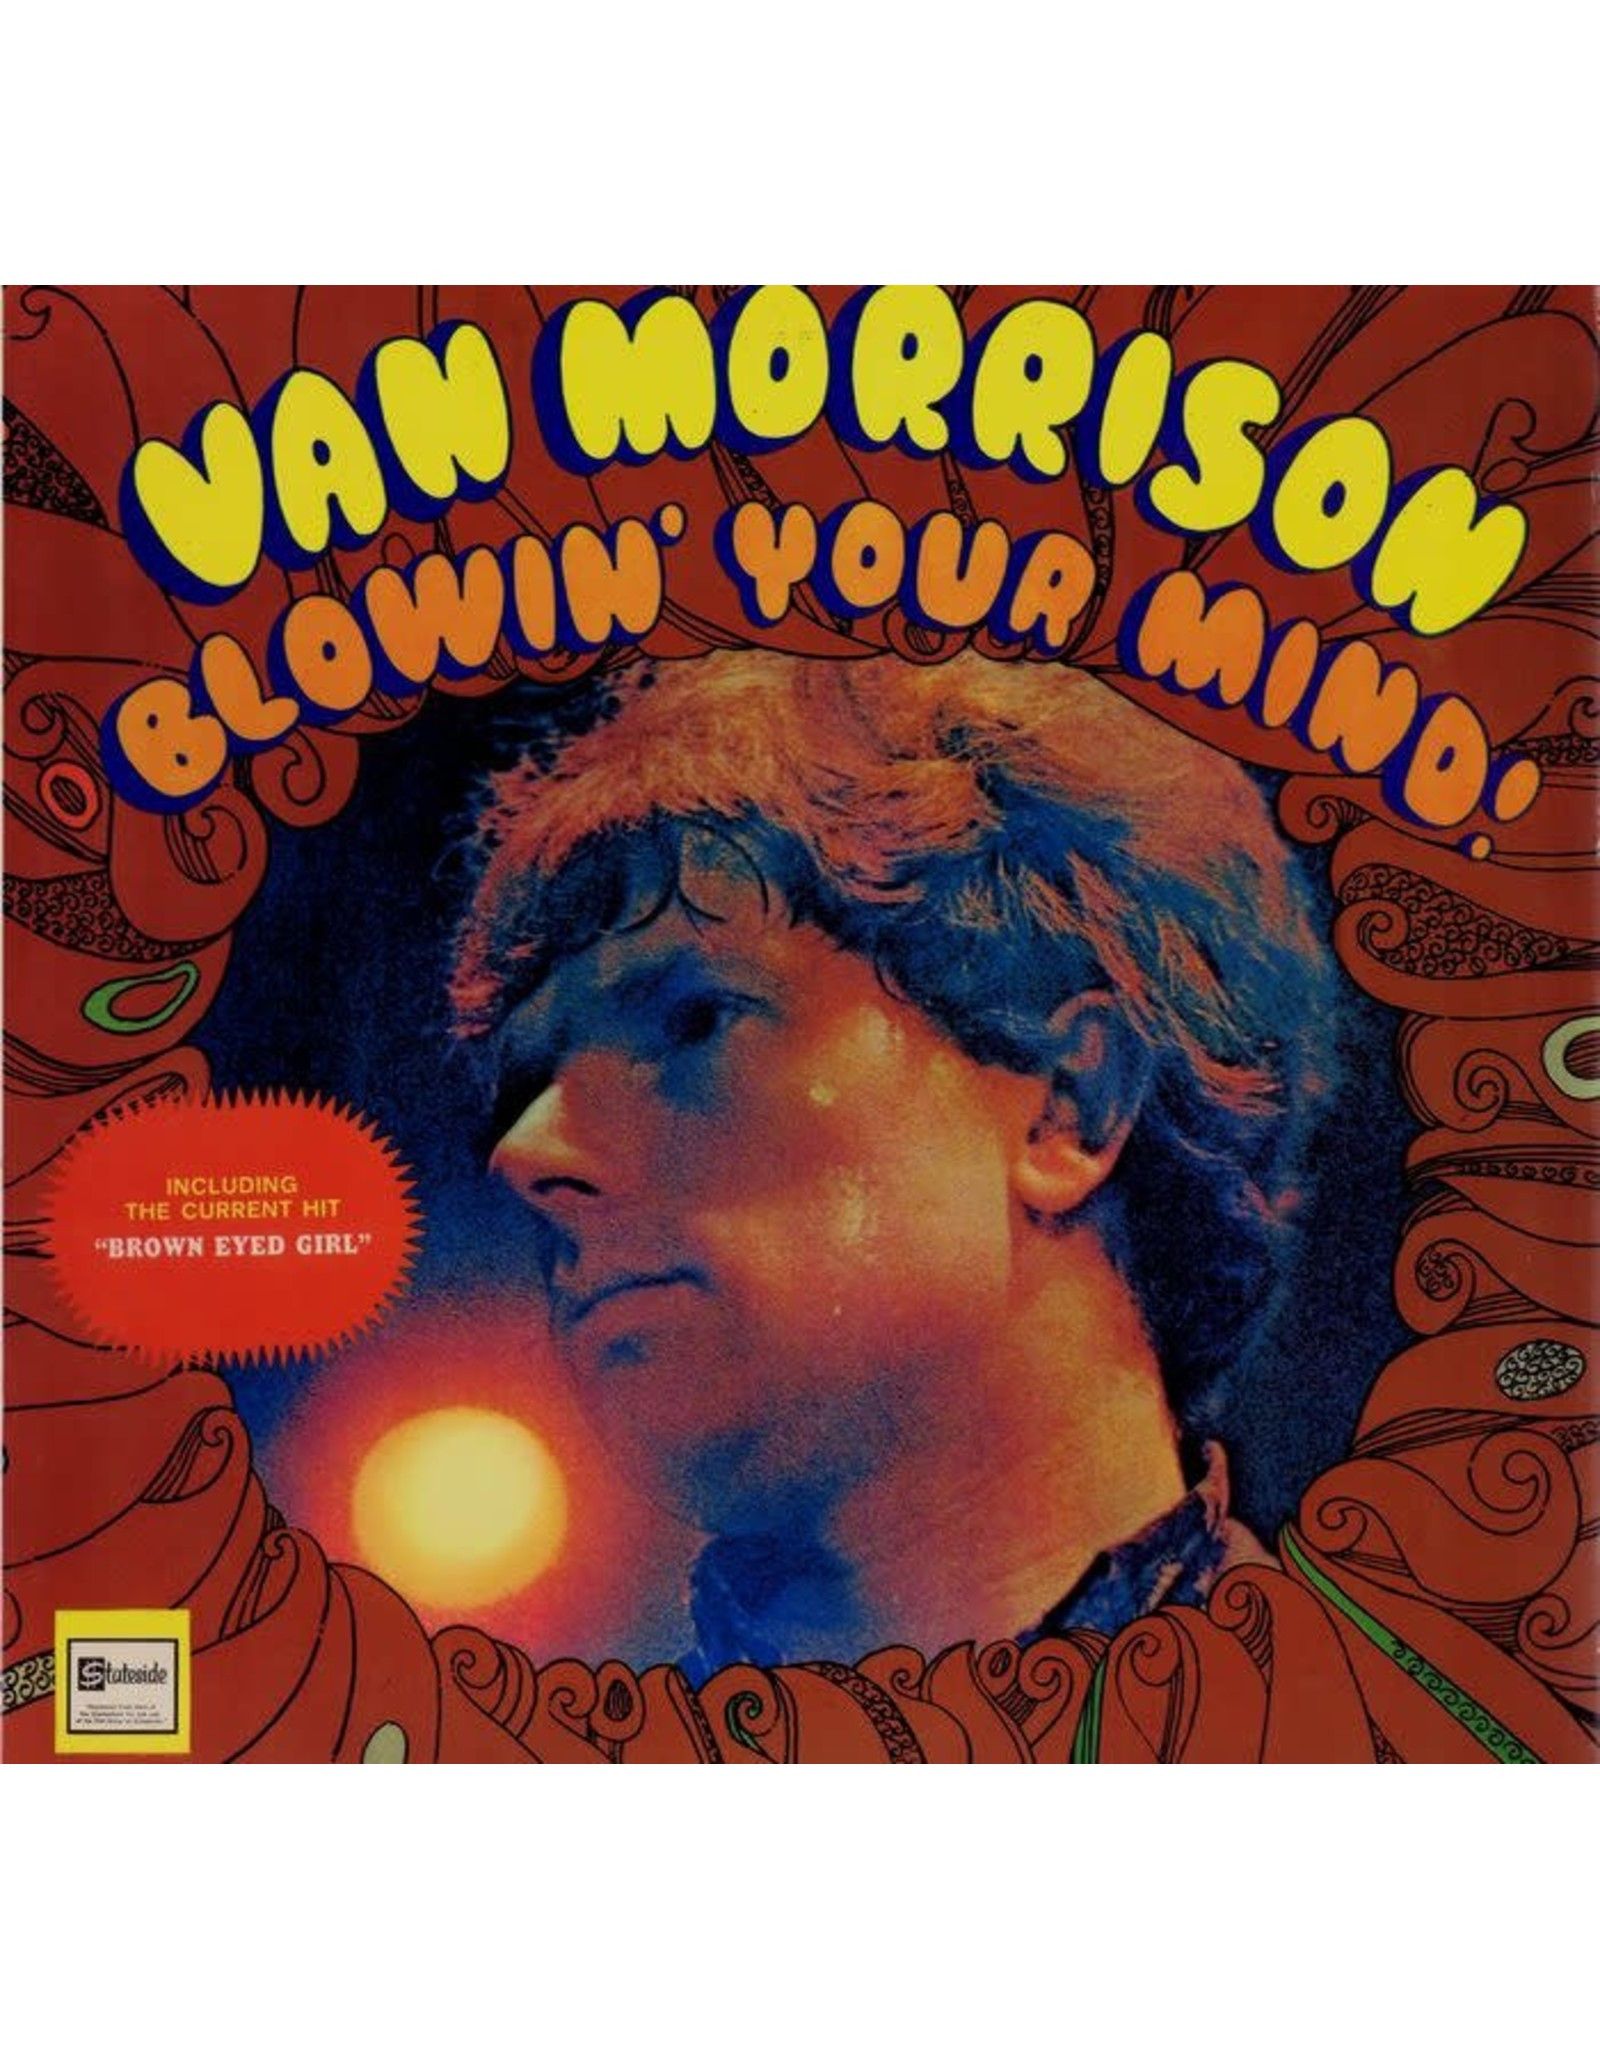 Morrison, Van - Blowin' Your Mind LP